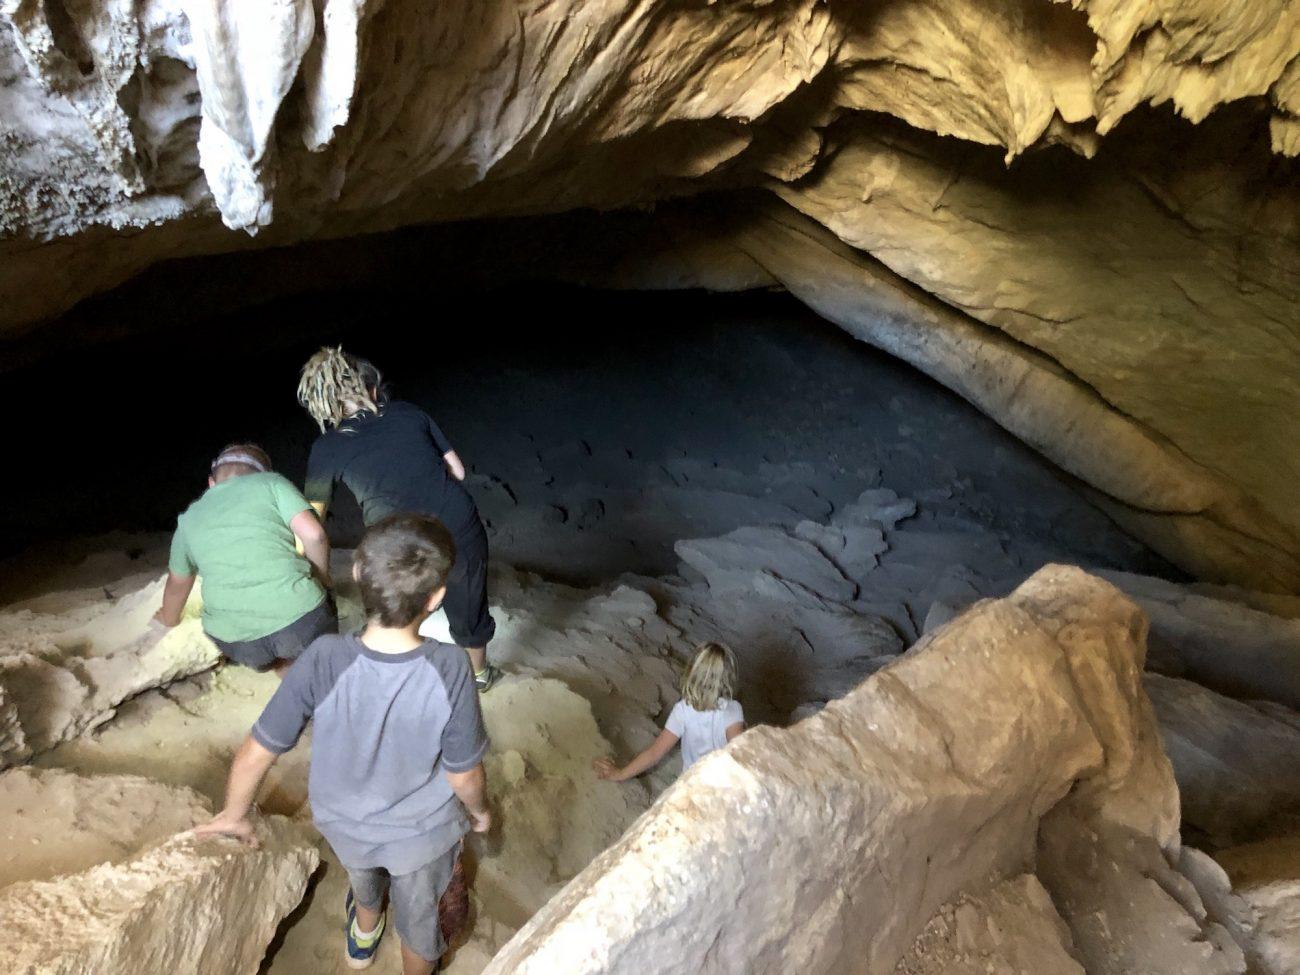 Kids Going in the Cave at Coronado National Memorial